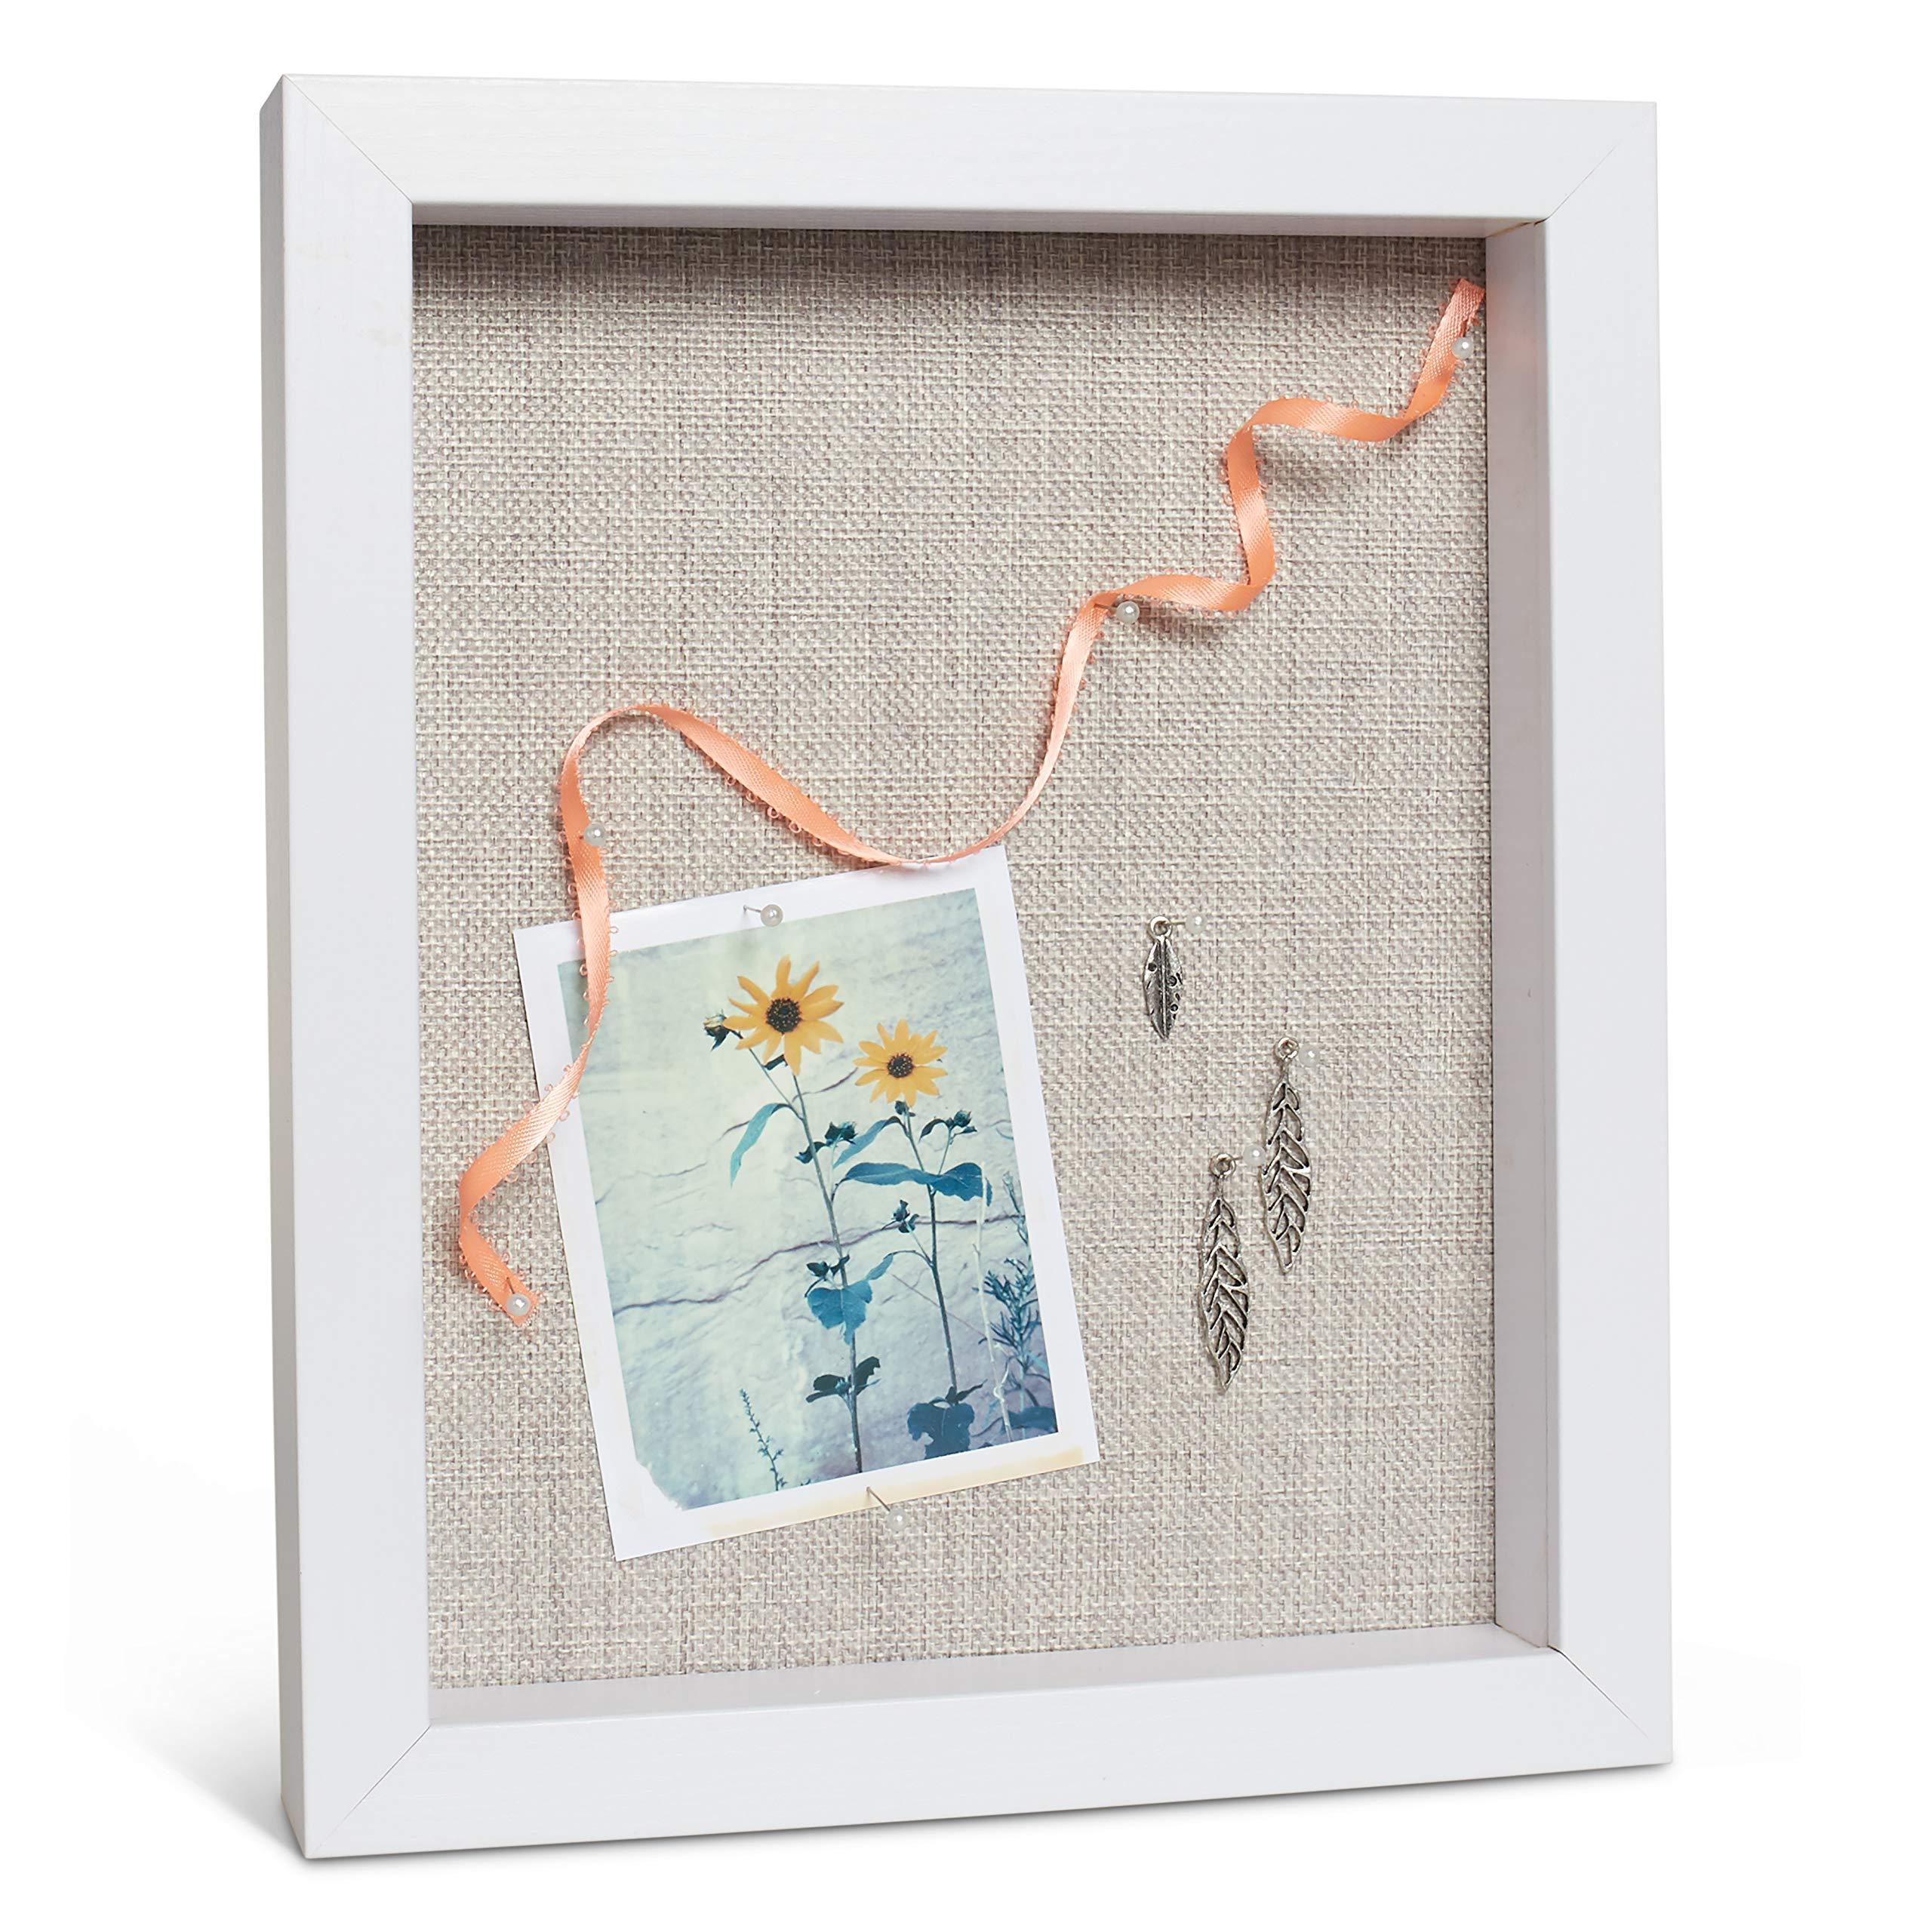 Wood Shadow Box Frame - Photo Display Case - Memorabilia/Memory/Picture/Medal/Memory Box - Hanging Shadowbox - Rustic Keepsake Display Center - Honeymoon/Wedding/Birthday Memory Displays (White) by Maika'i